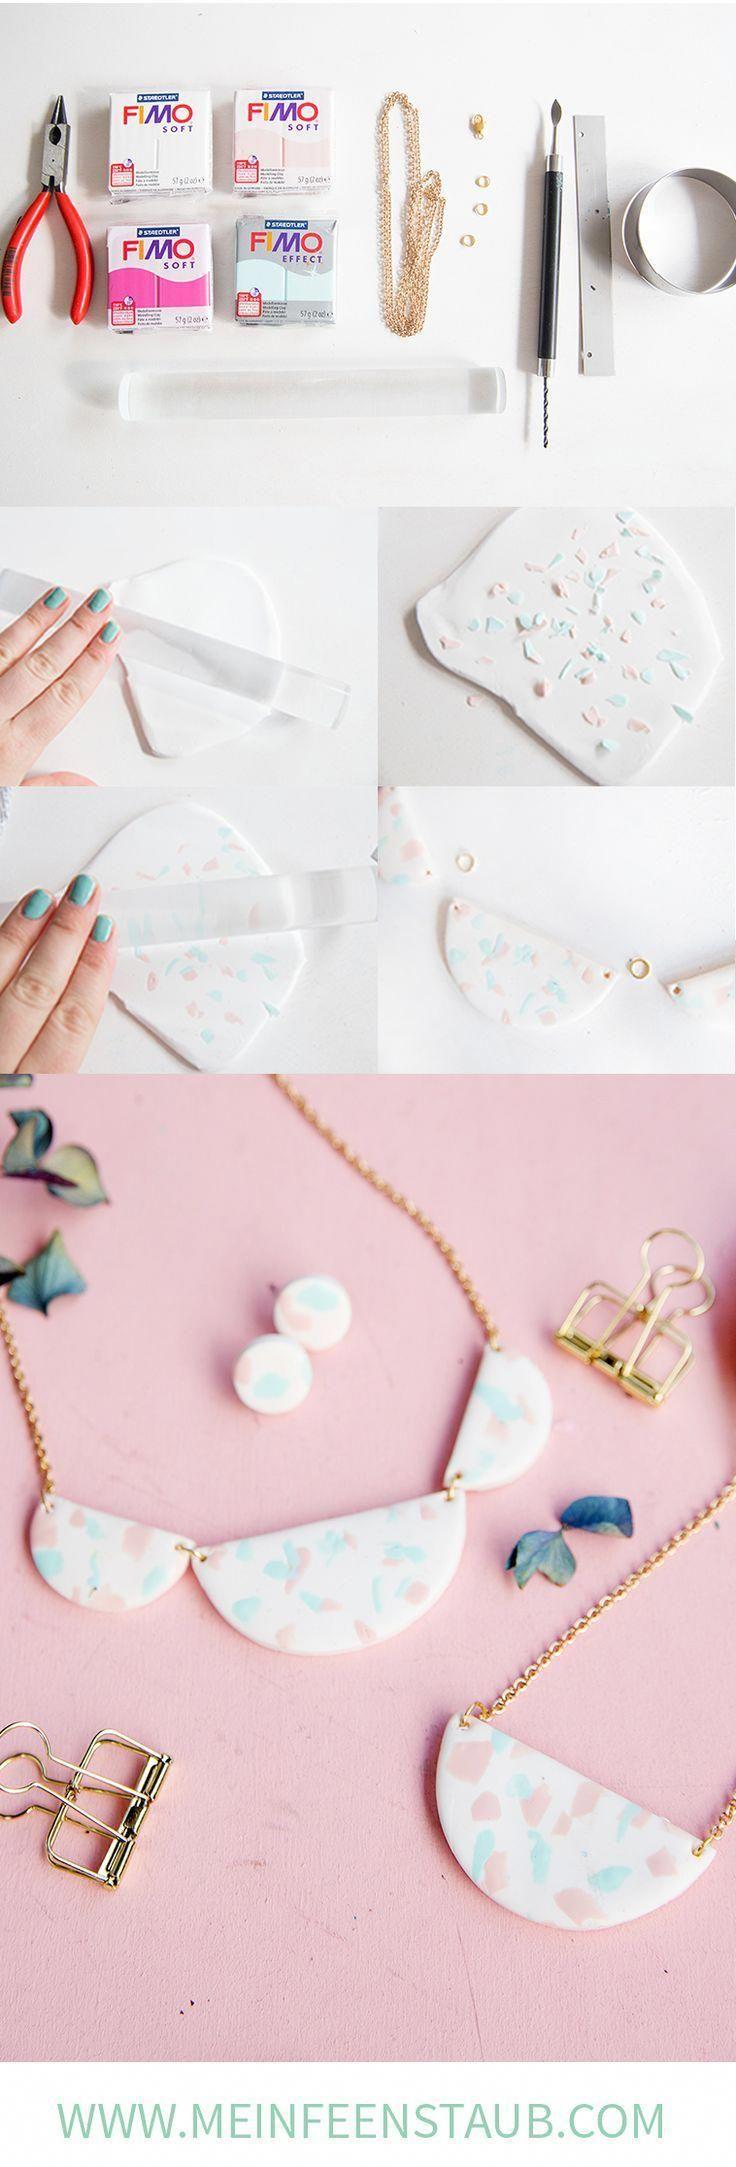 Photo of Blue Sapphire Necklace / Genuine Sapphire Necklace in 14k Gold / Unique Sapphire and Diamond Pendant / September Birthstone / Push Present – Fine Jewelry Ideas